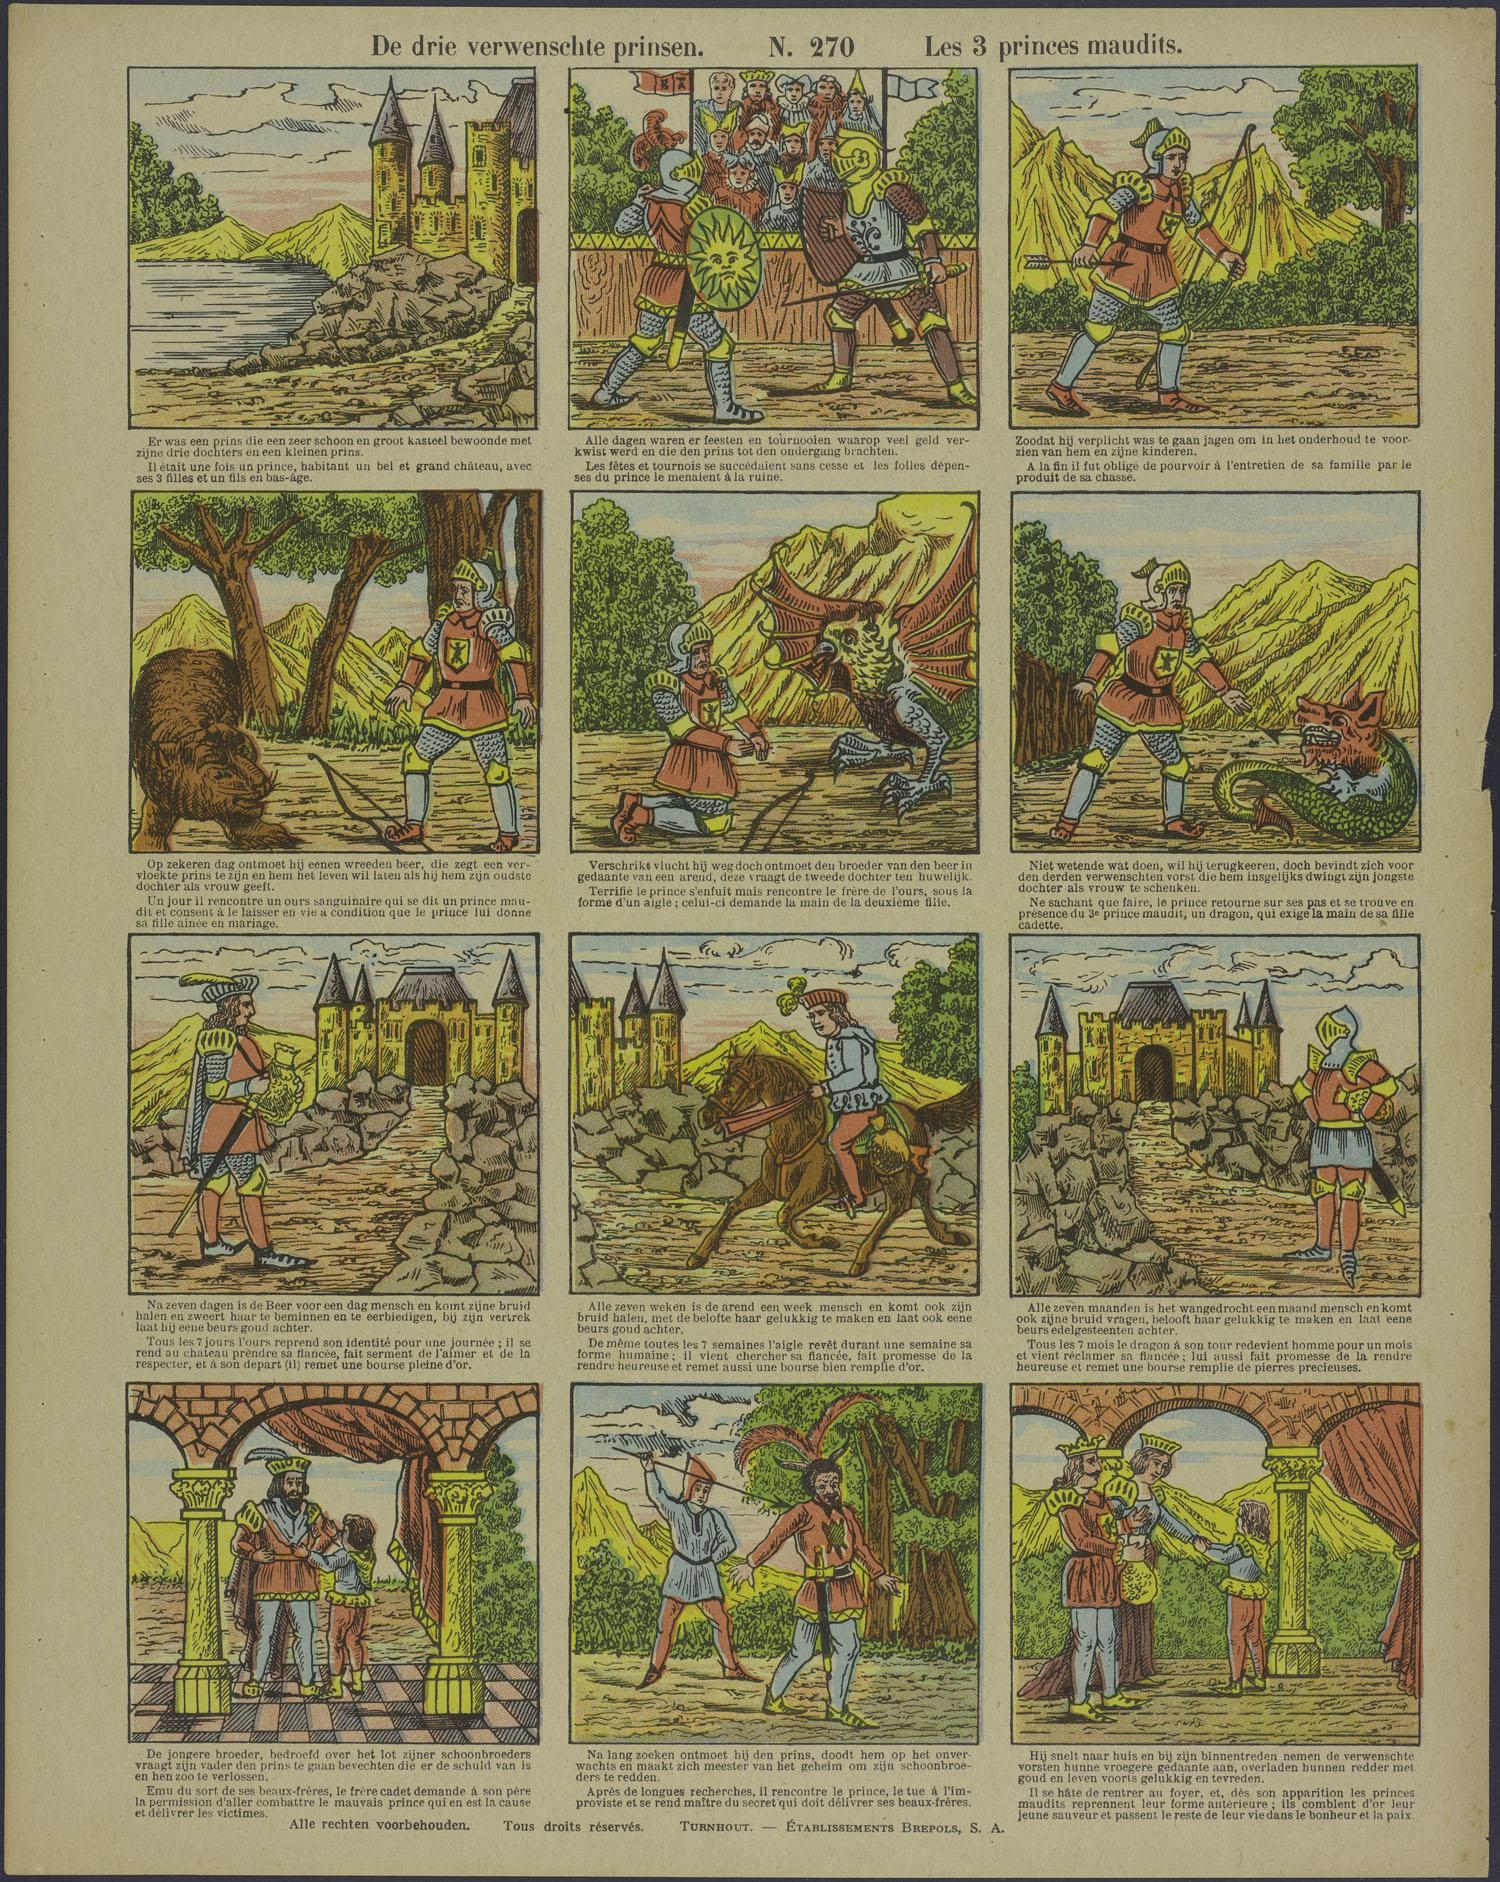 Cherche Fiance Pour Une Semaine : cherche, fiance, semaine, File:De, Verwenschte, Prinsen-Catchpenny, Print-Borms, 0329.jpeg, Wikimedia, Commons